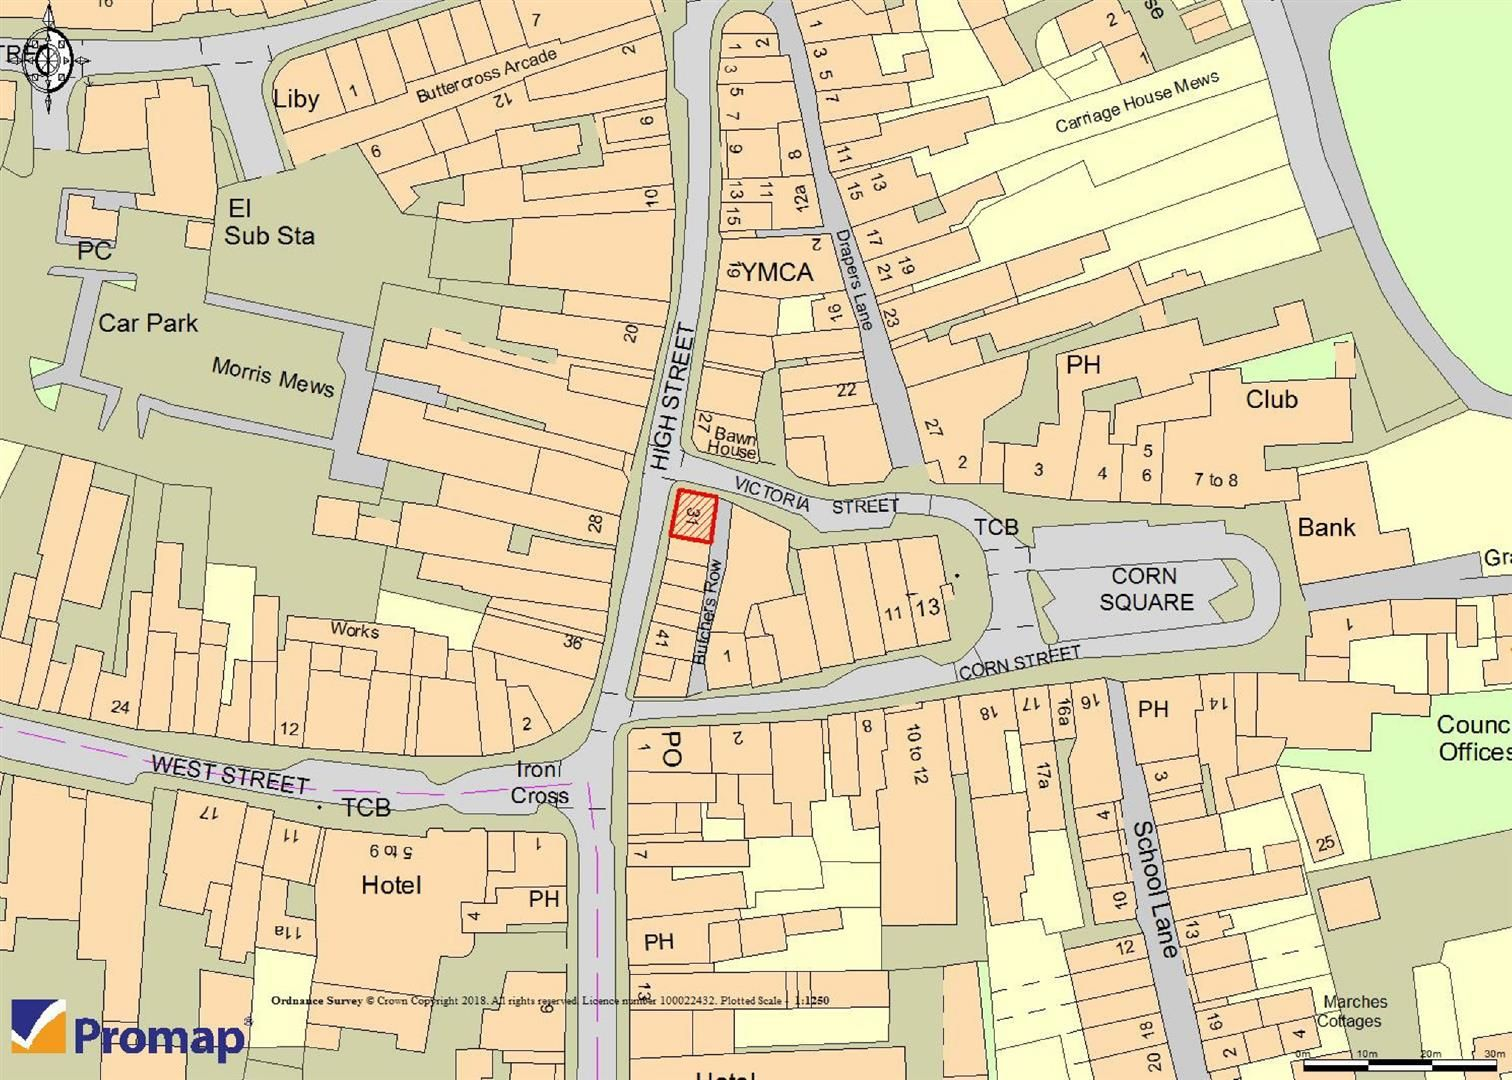 3 bed  for sale in Leominster - Property Floorplan